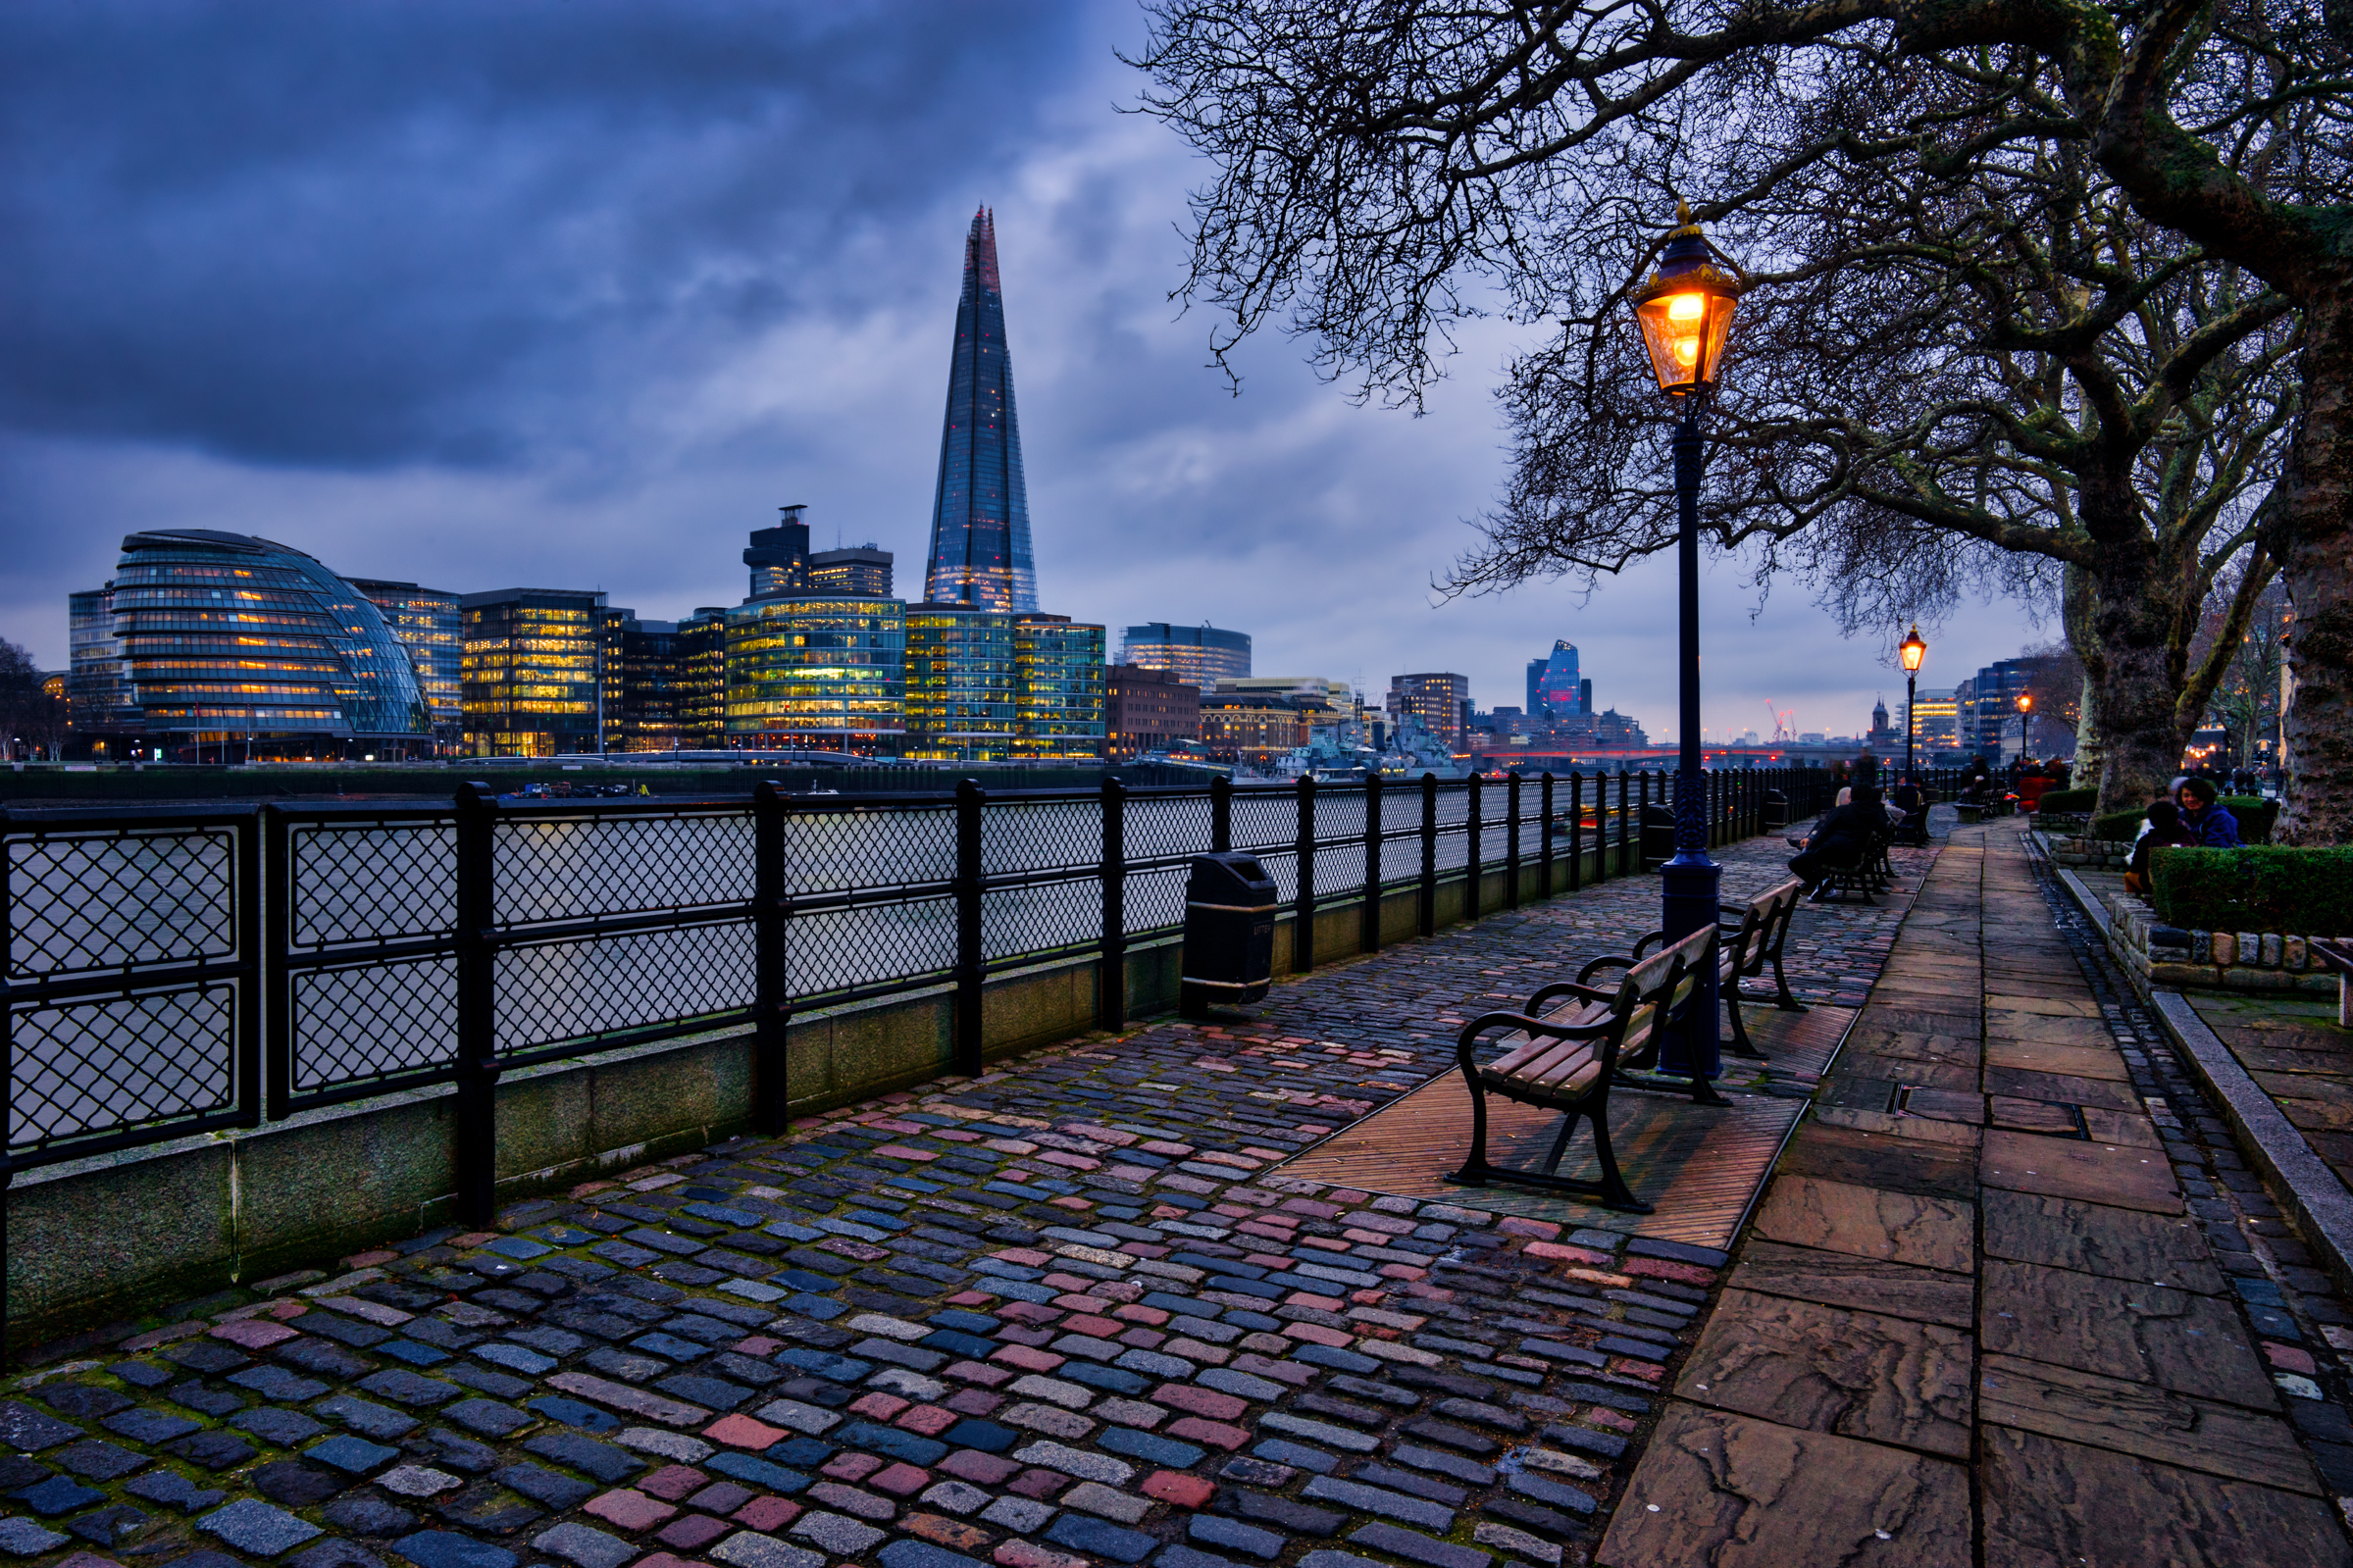 London-Jan18-Towerside-blue-hour-Shardview-HDR1.jpg